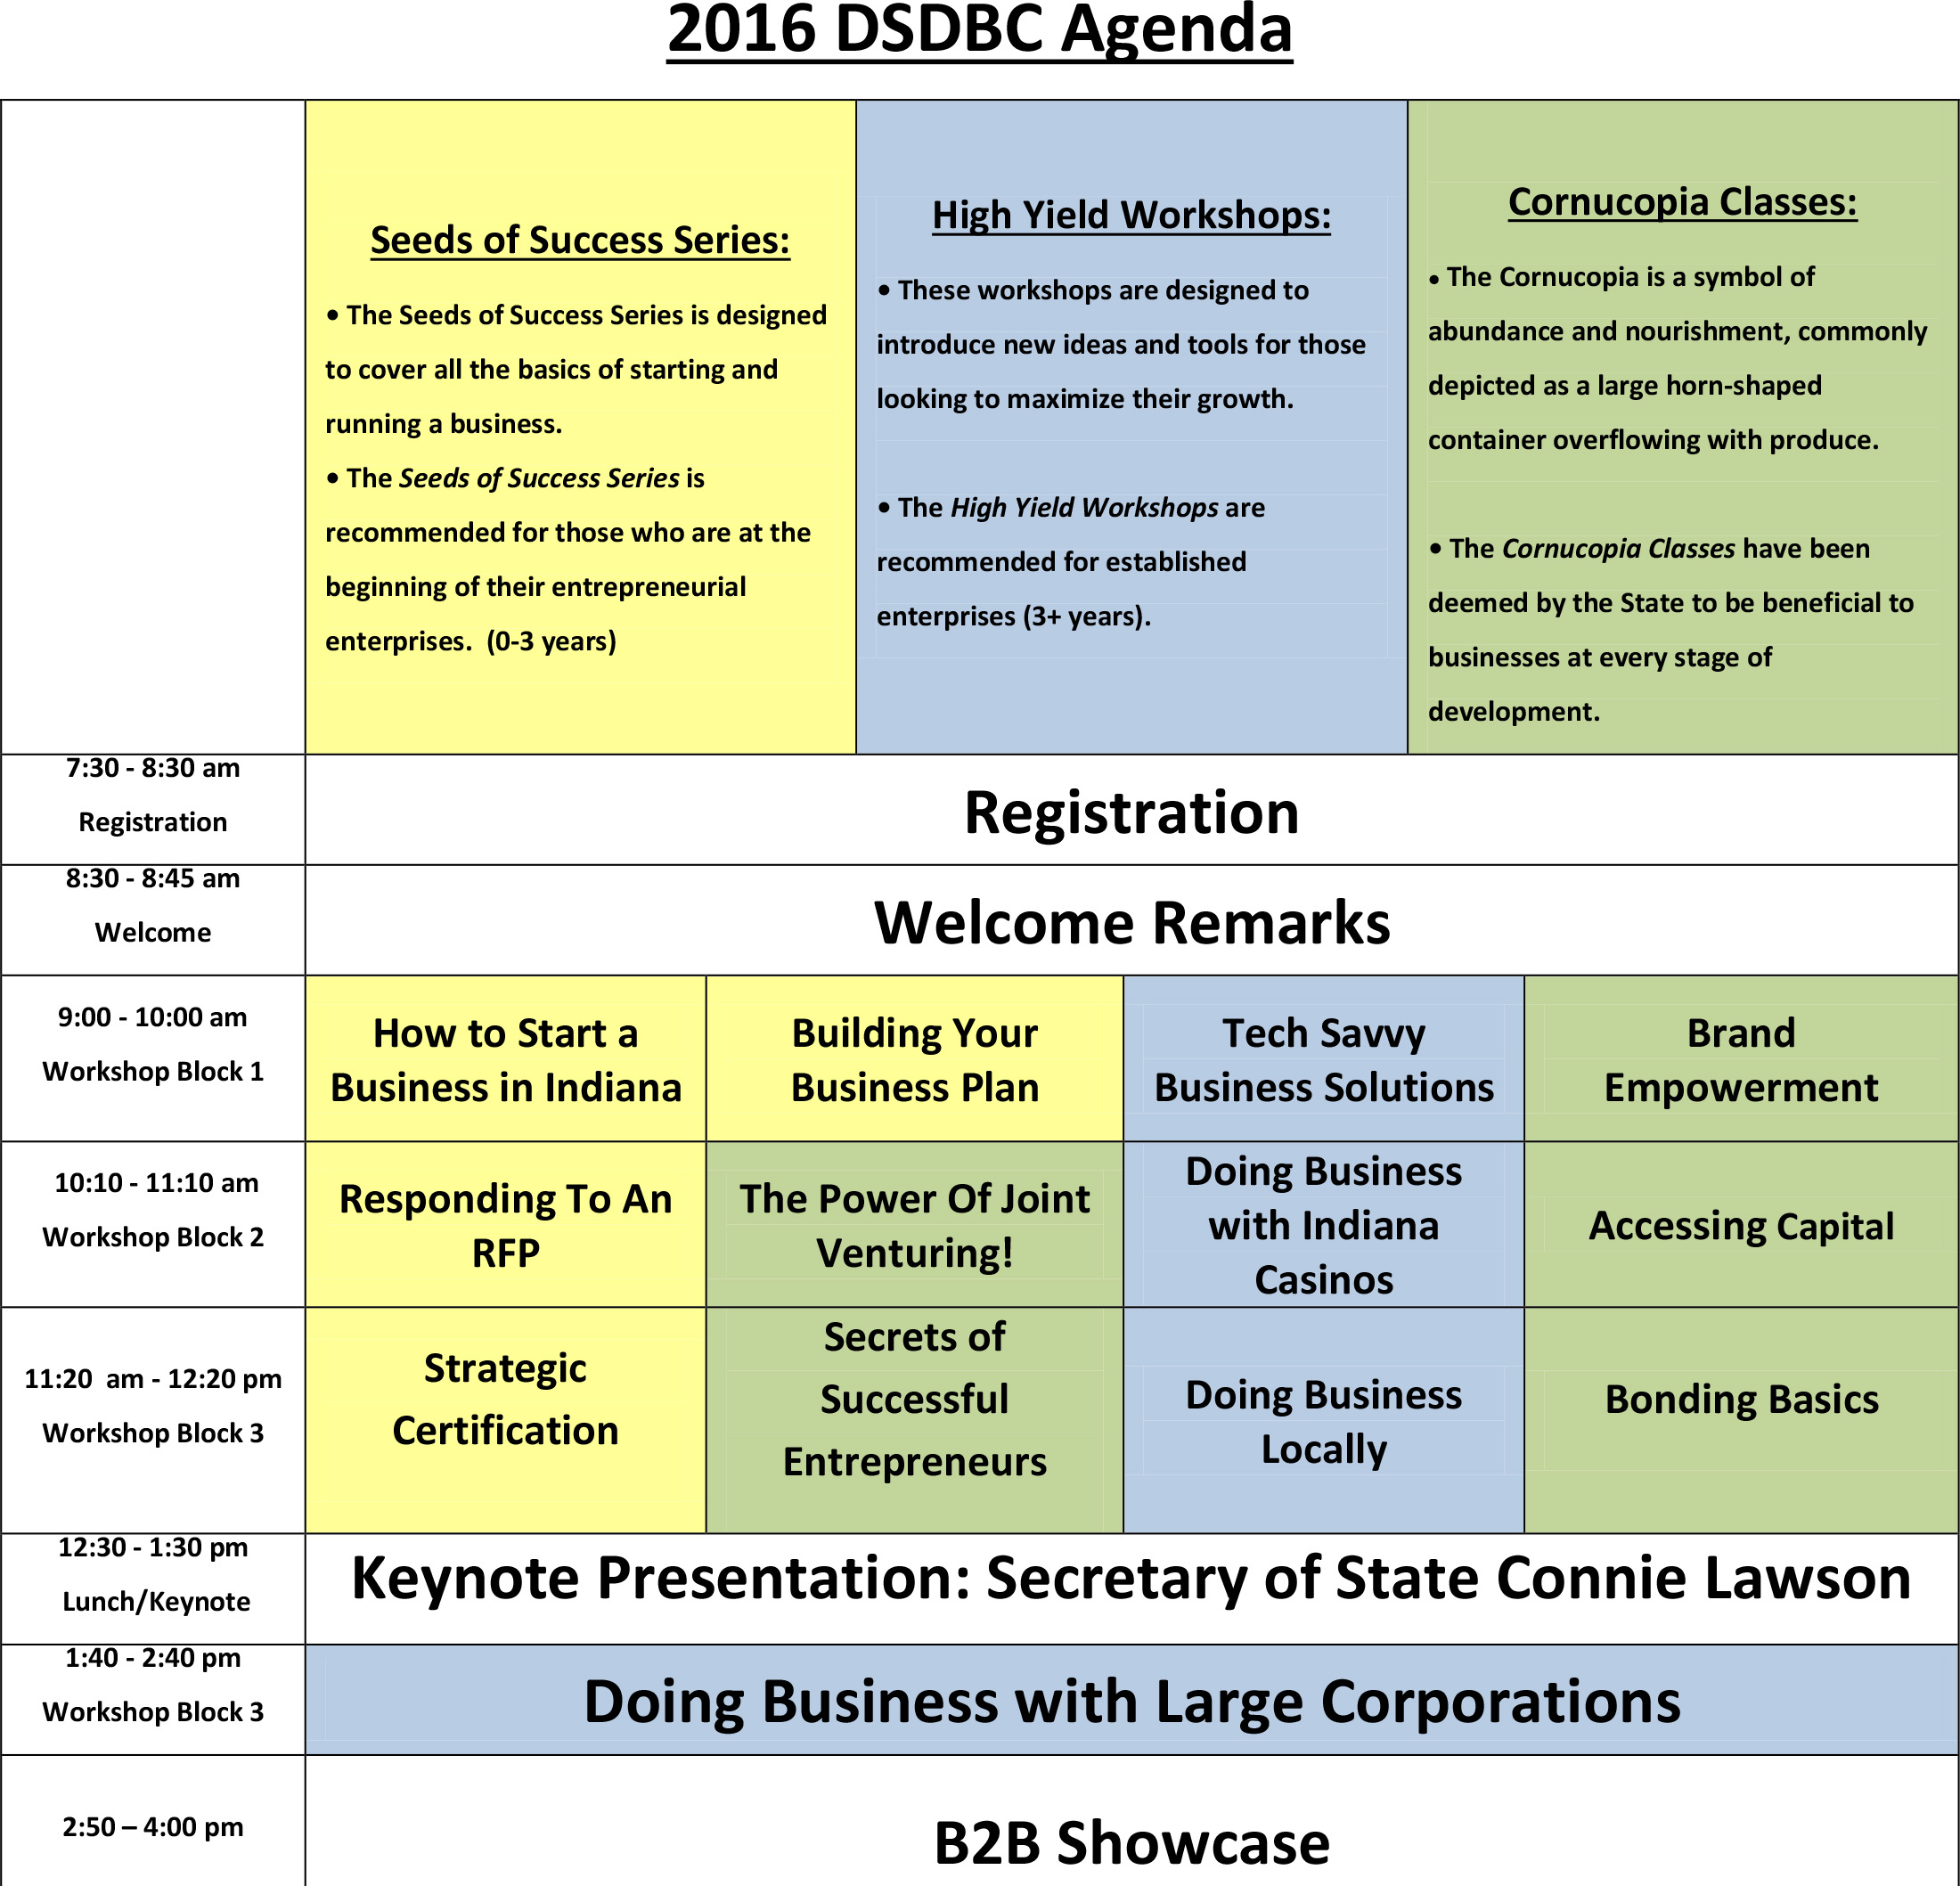 DSDBC Agenda